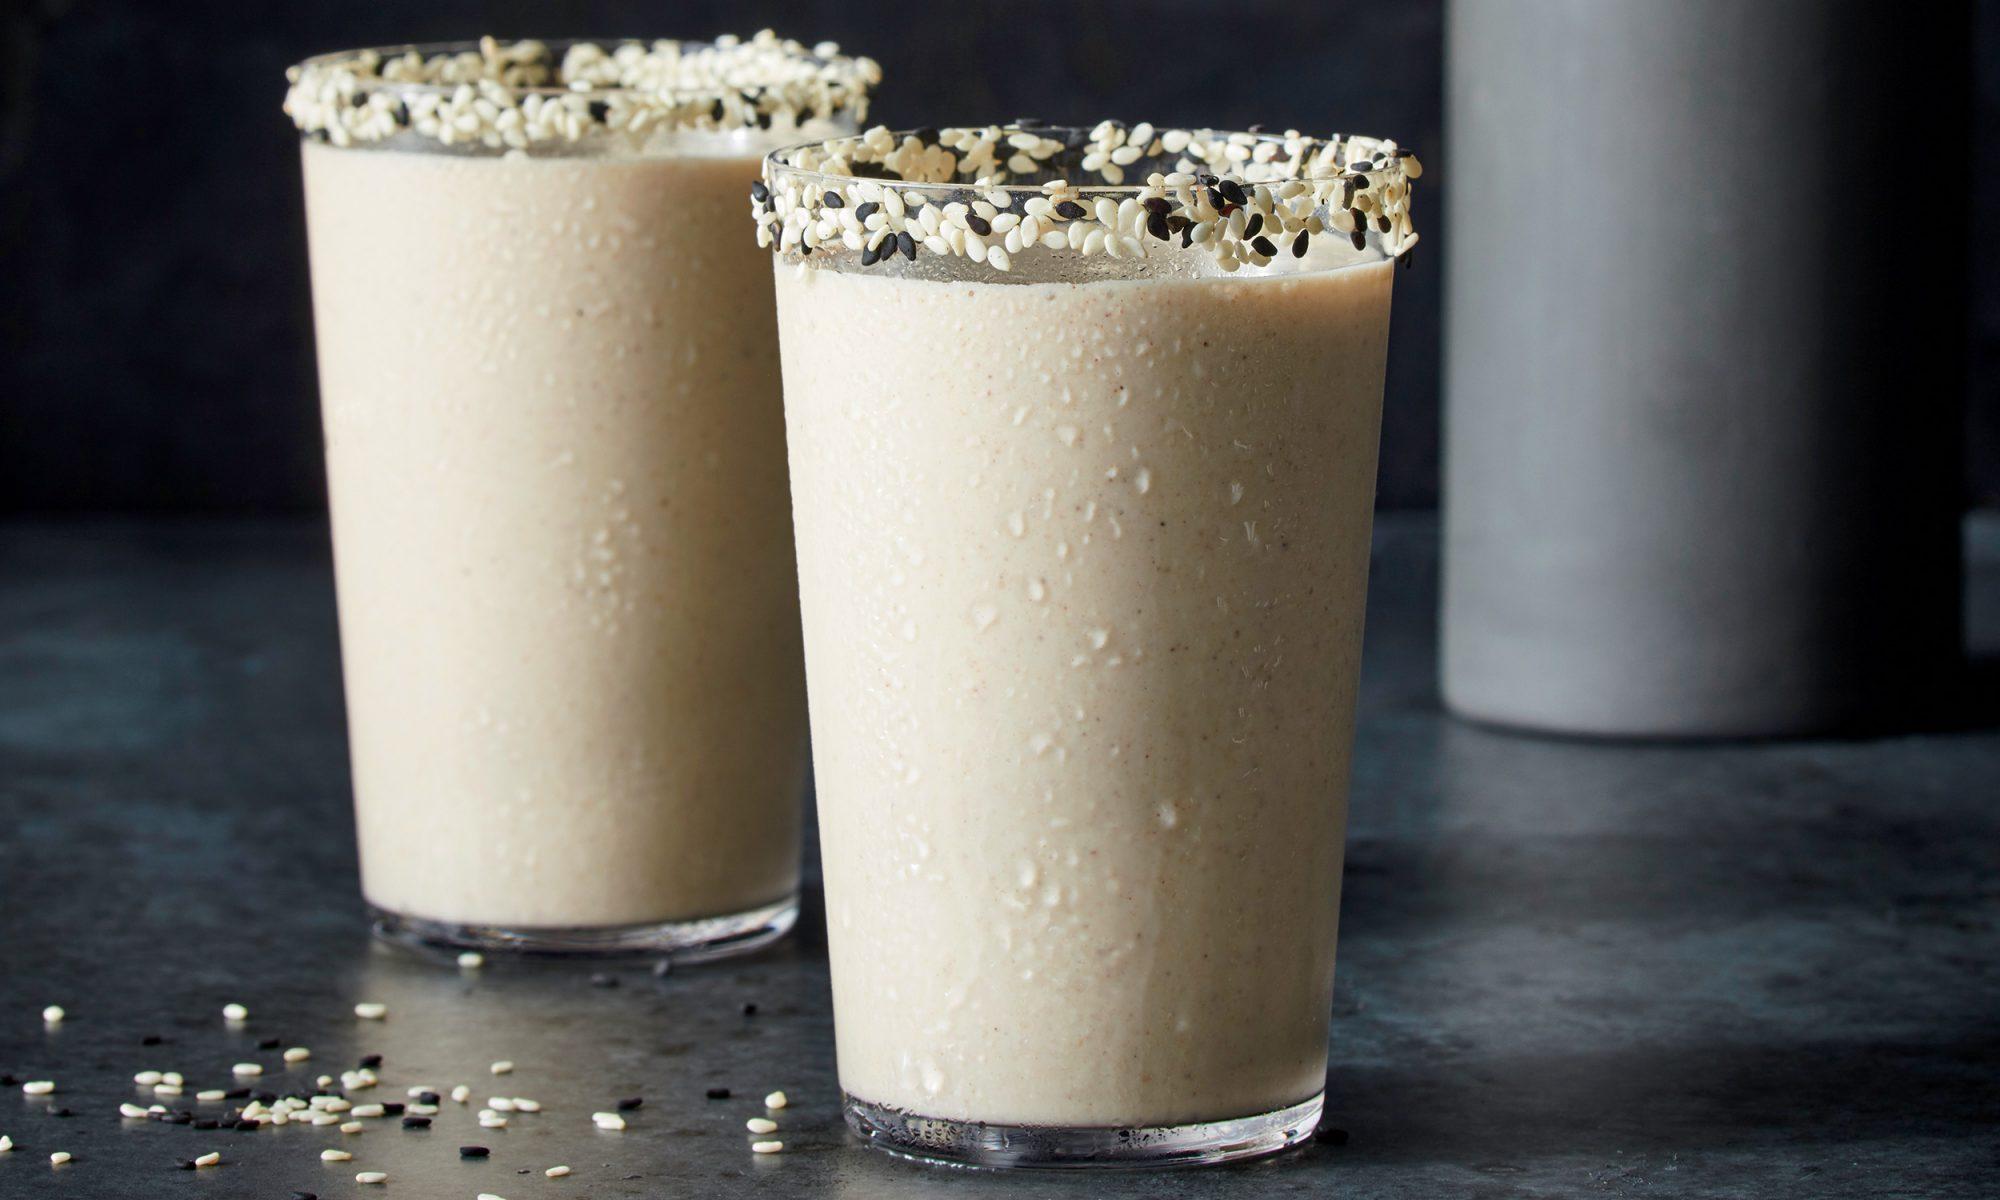 Yogurt, Dates, and Tahini Make One Hell of a Milkshake